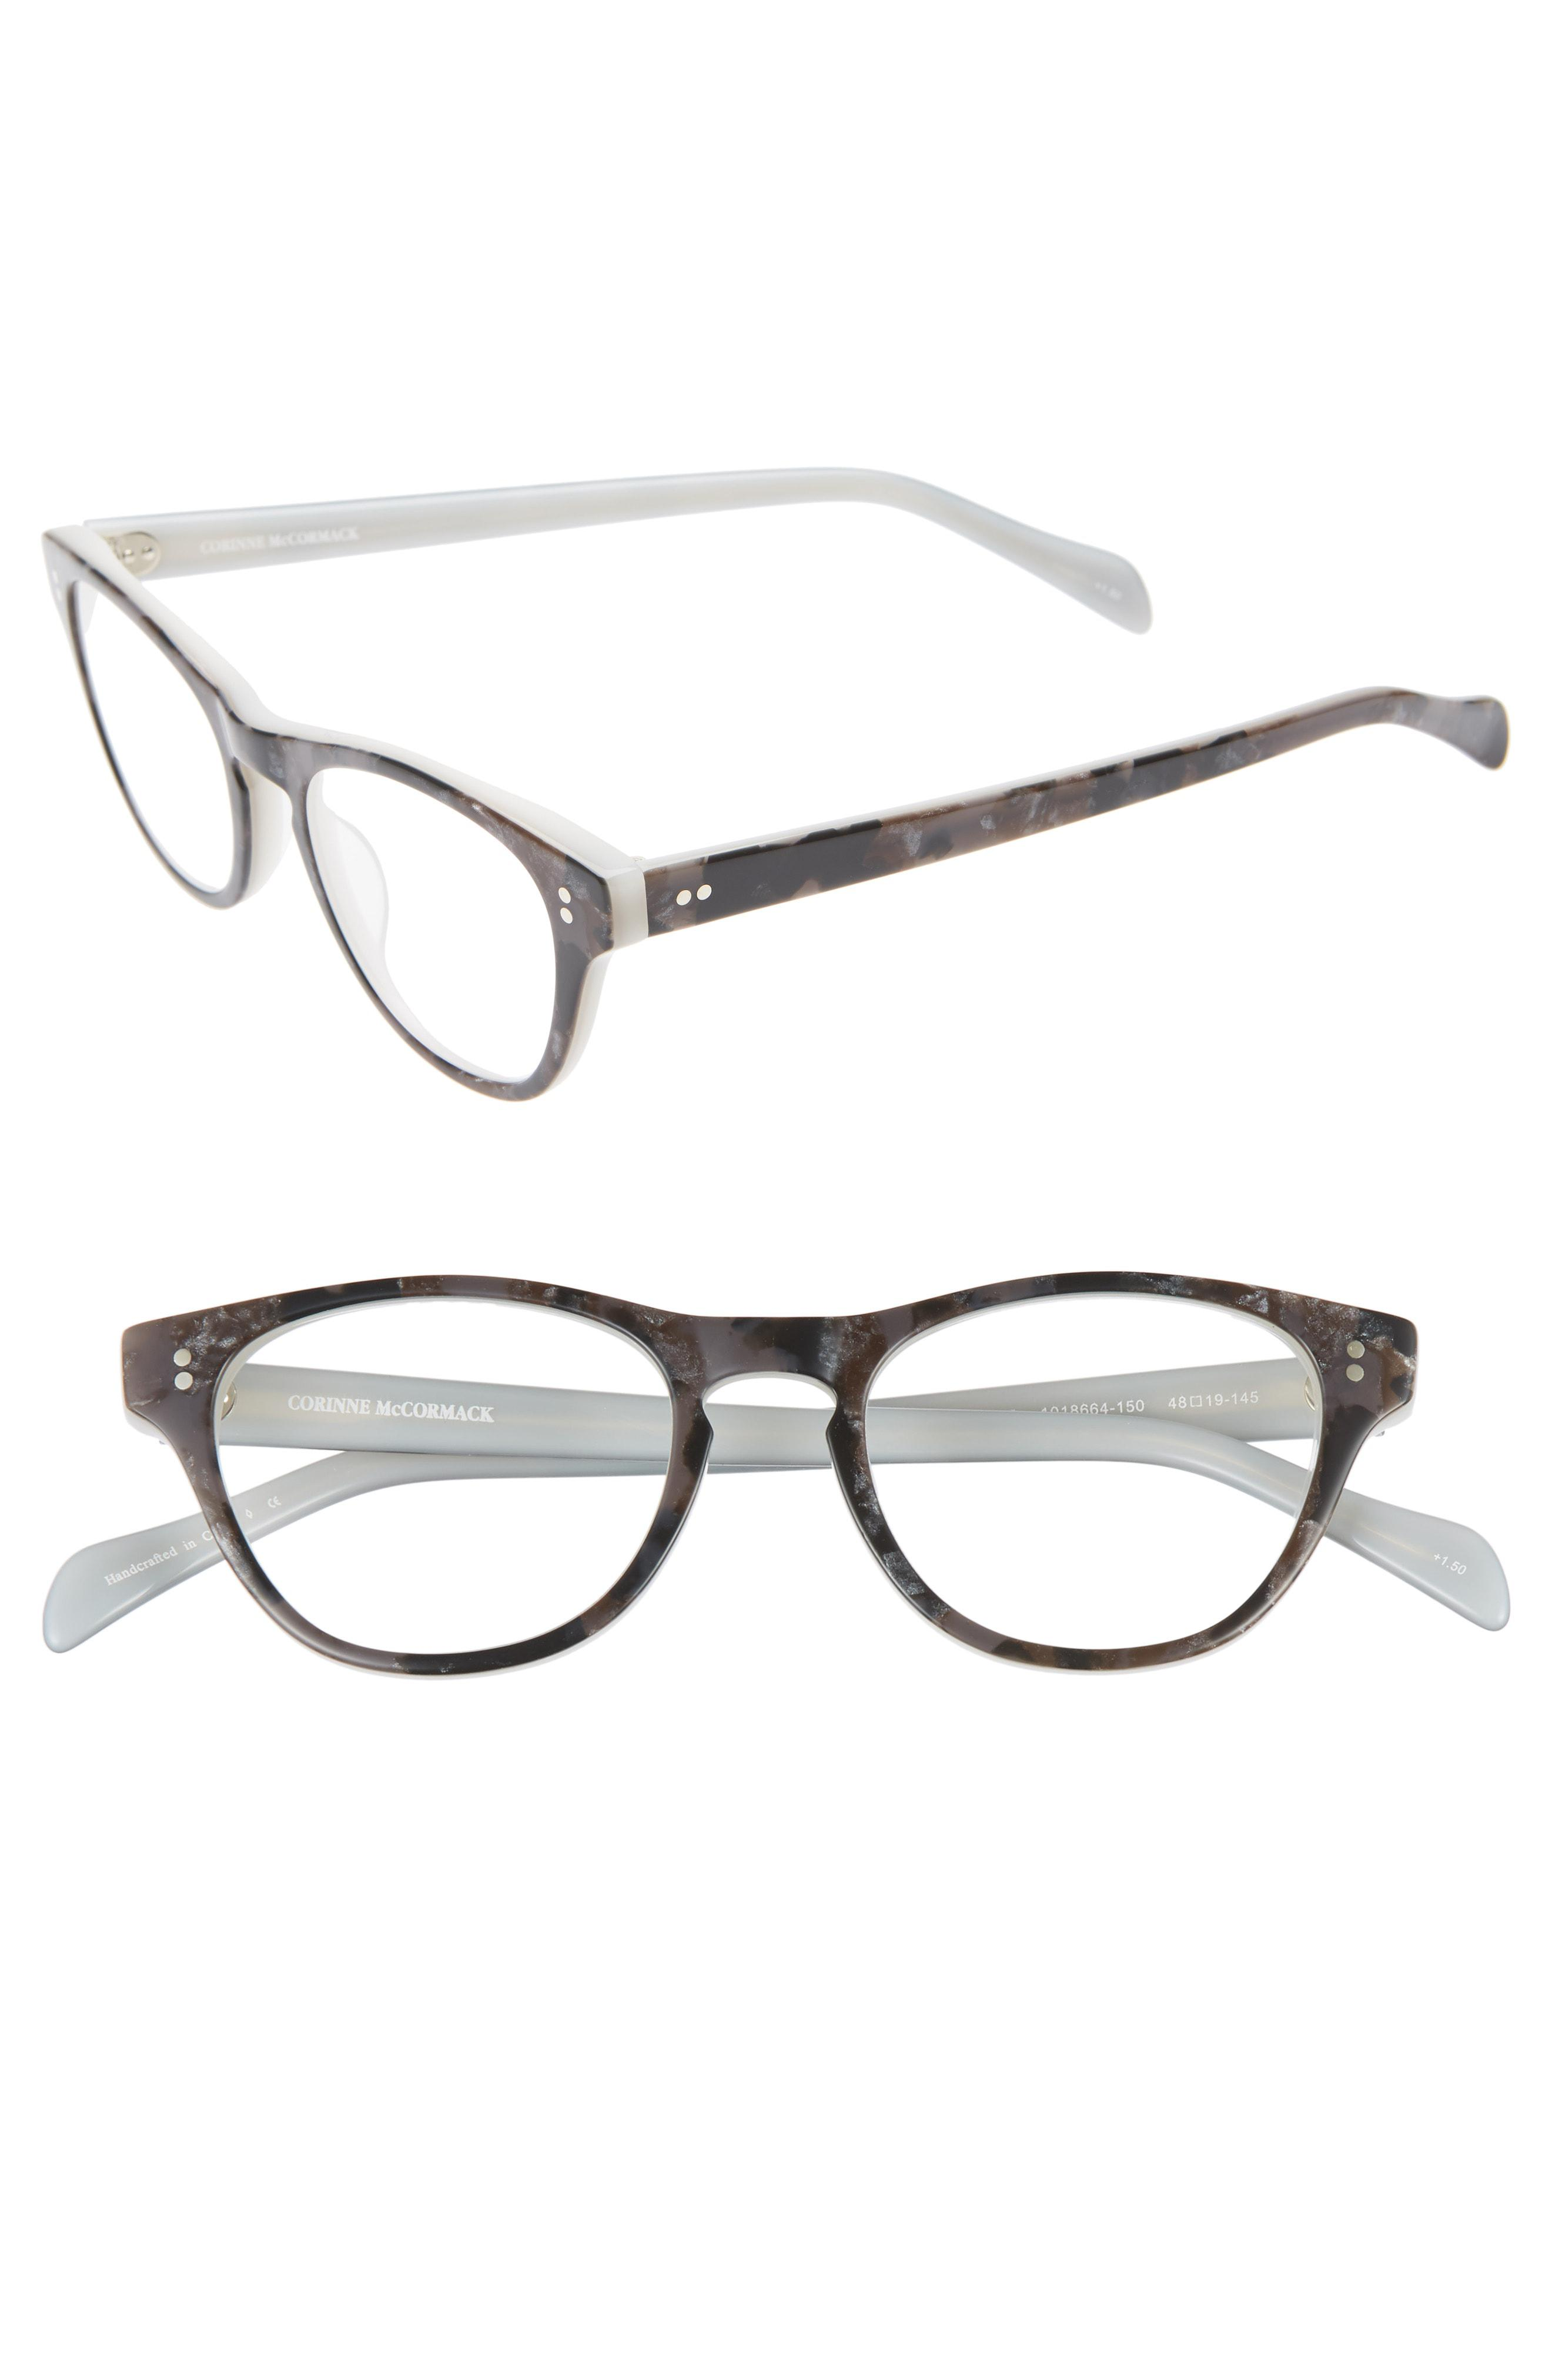 4b3187f6fbbb Corinne Mccormack - Multicolor Belle 48mm Reading Glasses - - Lyst. View  fullscreen